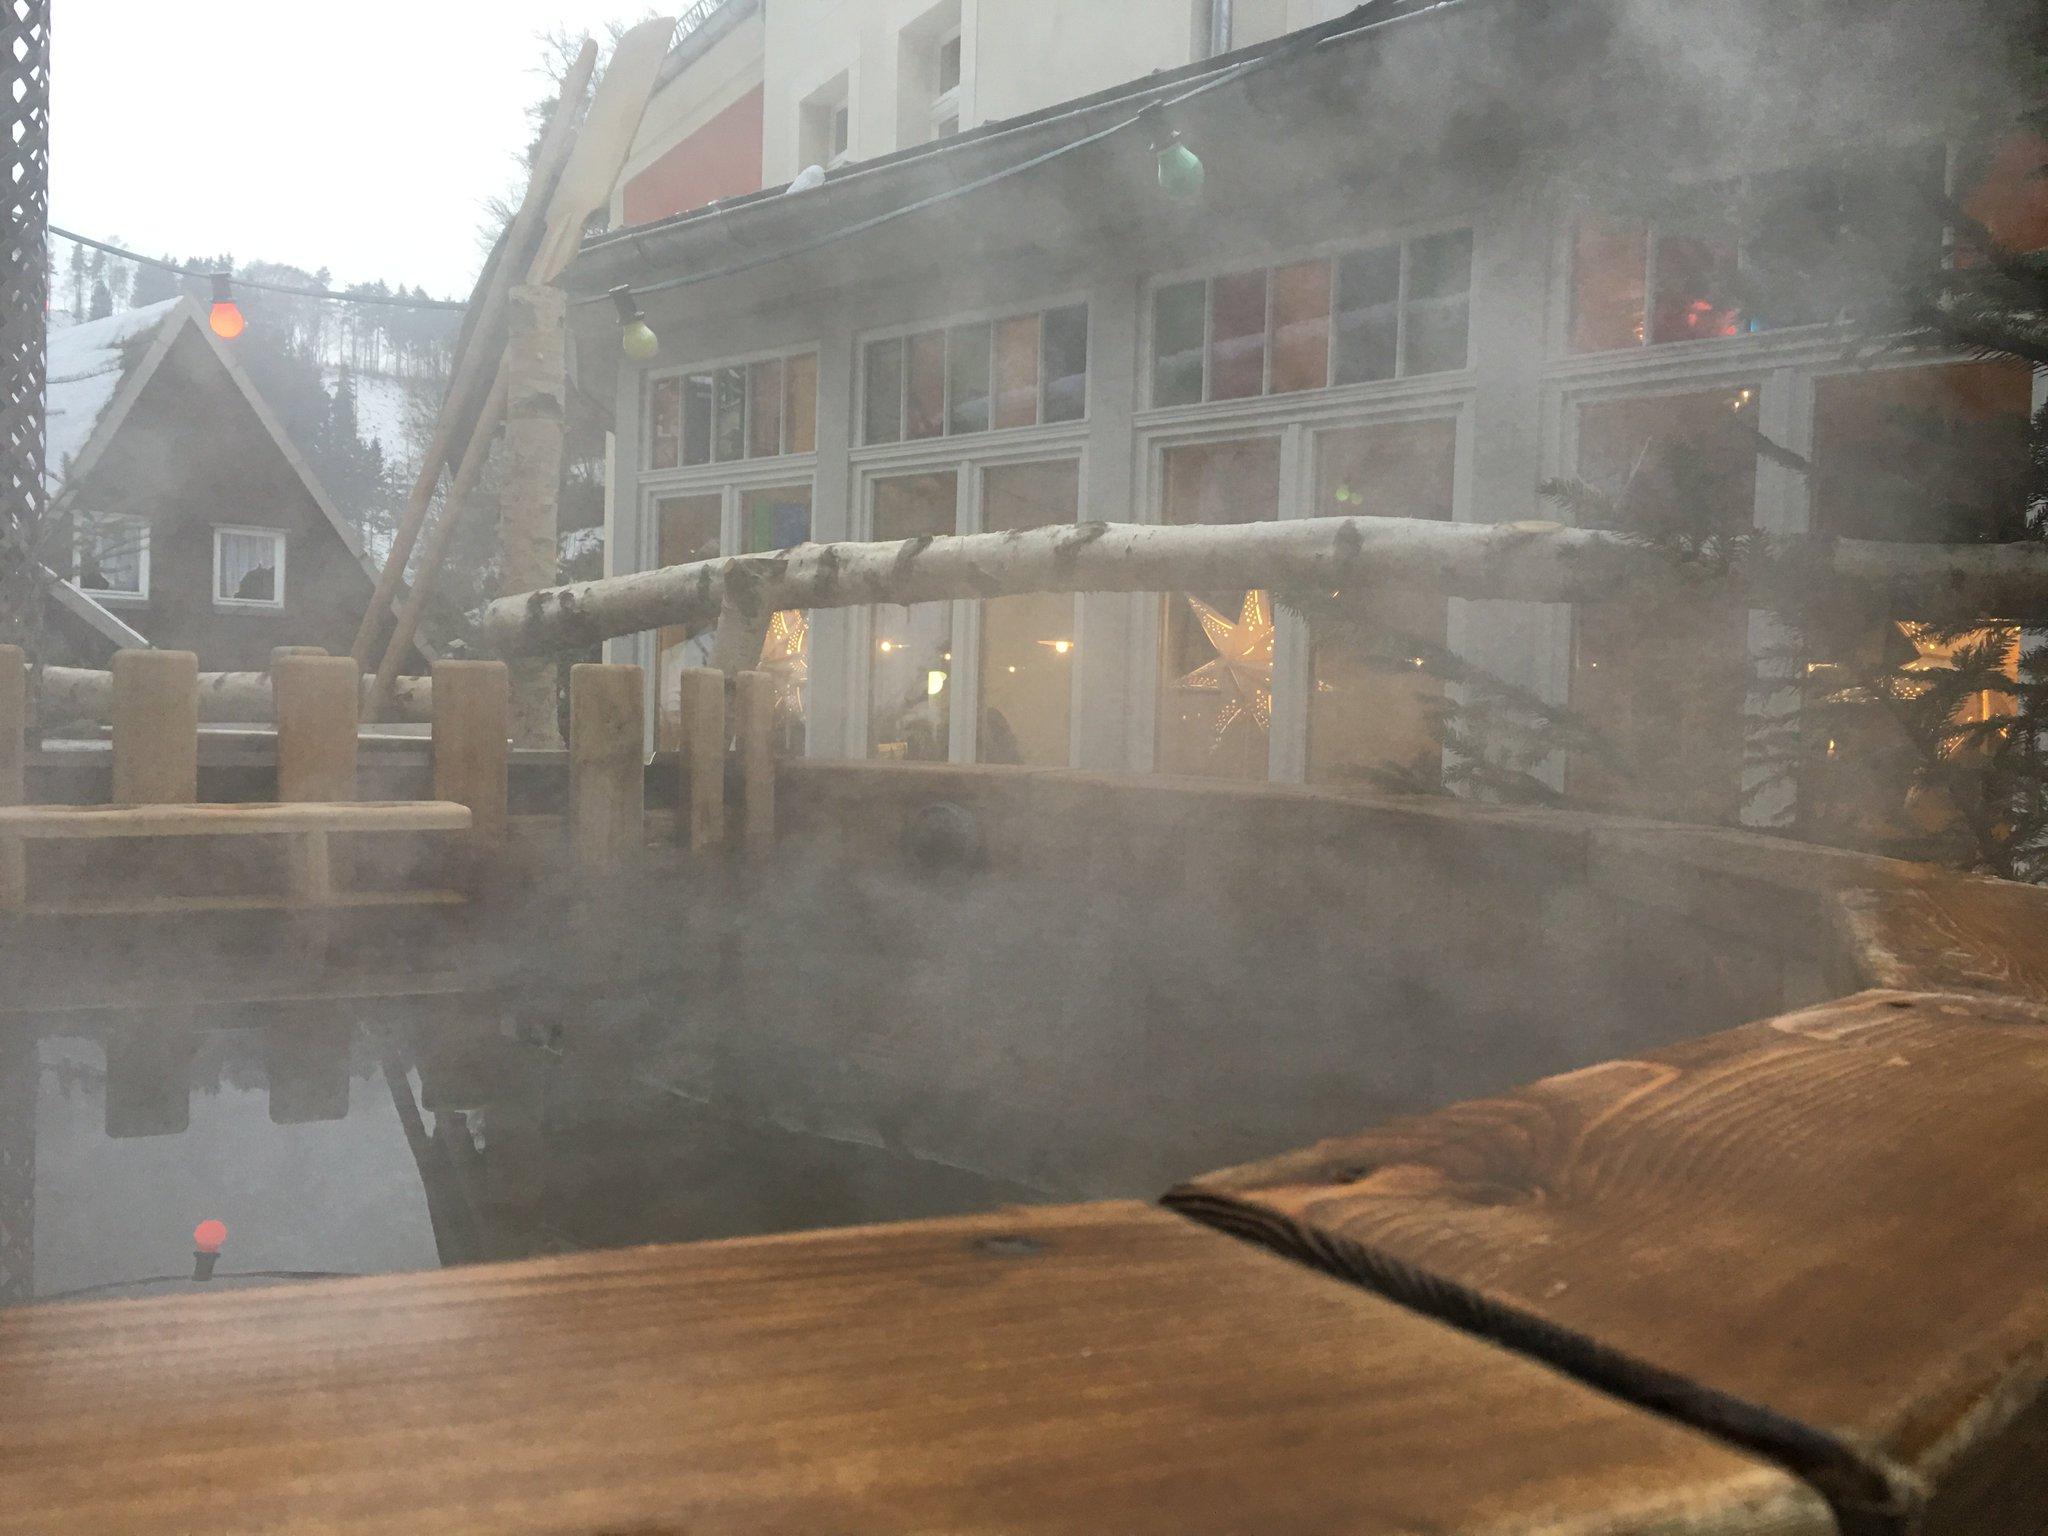 Der Zuber wäre dann warm. Wer mag? #schmilka #saechsischeschweiz #meurers https://t.co/k2YAyxS4xV